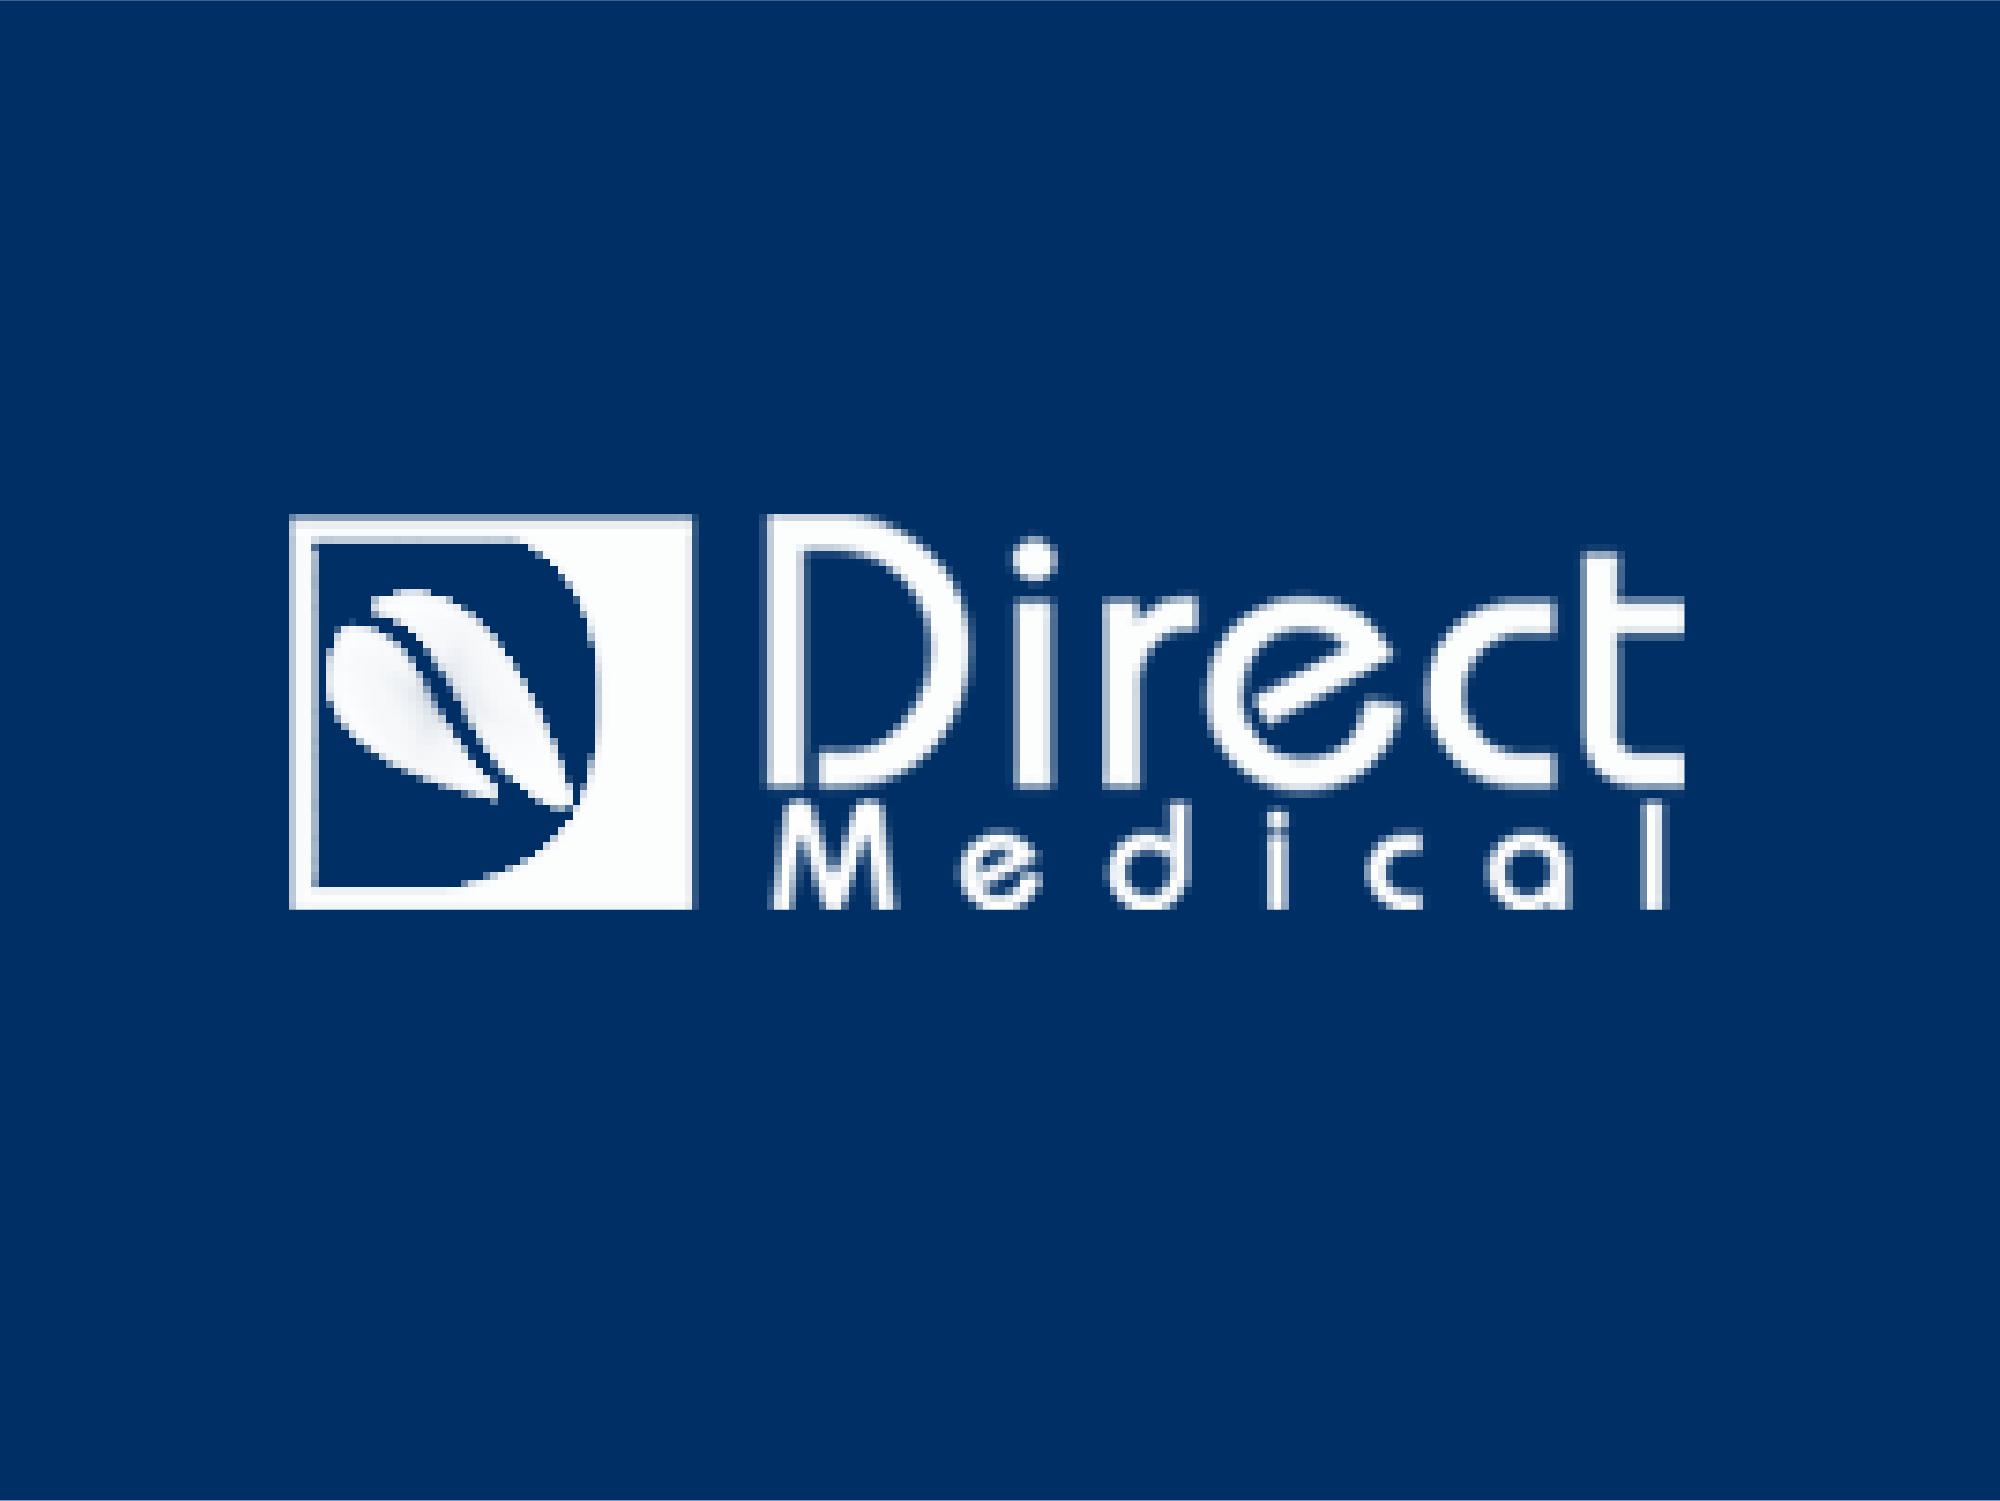 Direct Medical - Sale of Direct Medical to Vivisol plc